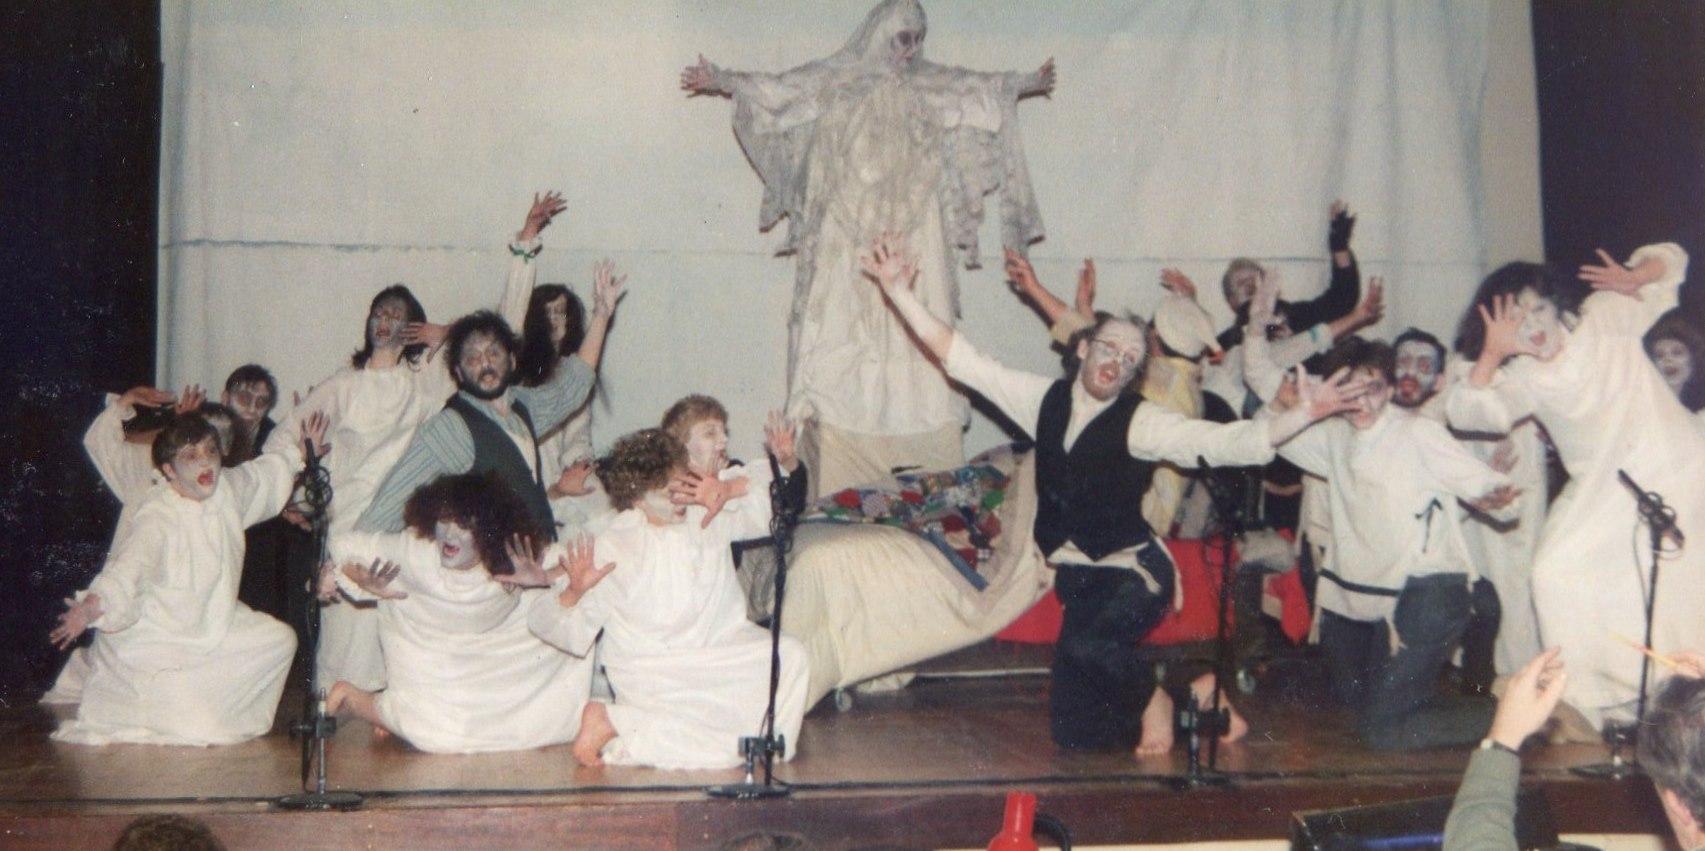 Fiddler on the Roof, 1991 (www.lmvg.ie) (28)